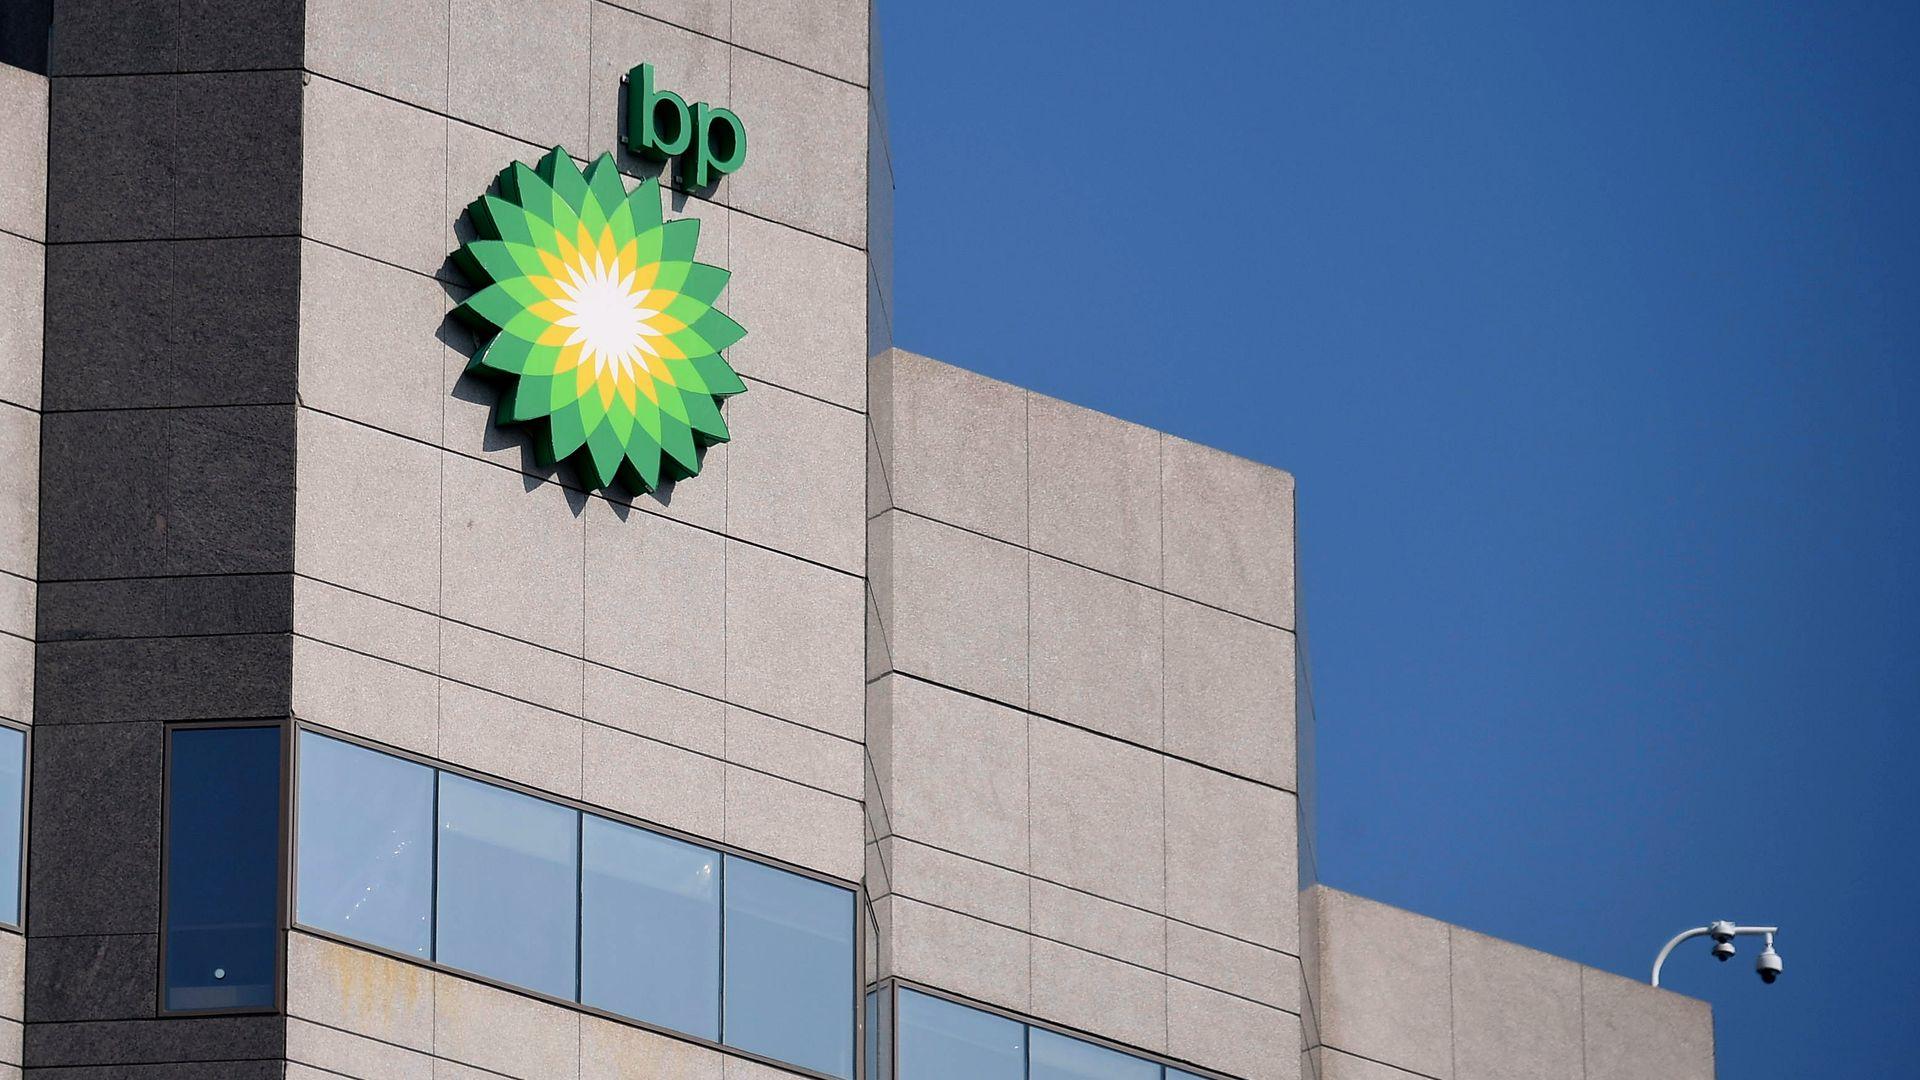 BP Exploration Alaska headquarters in Anchorage, Alaska.